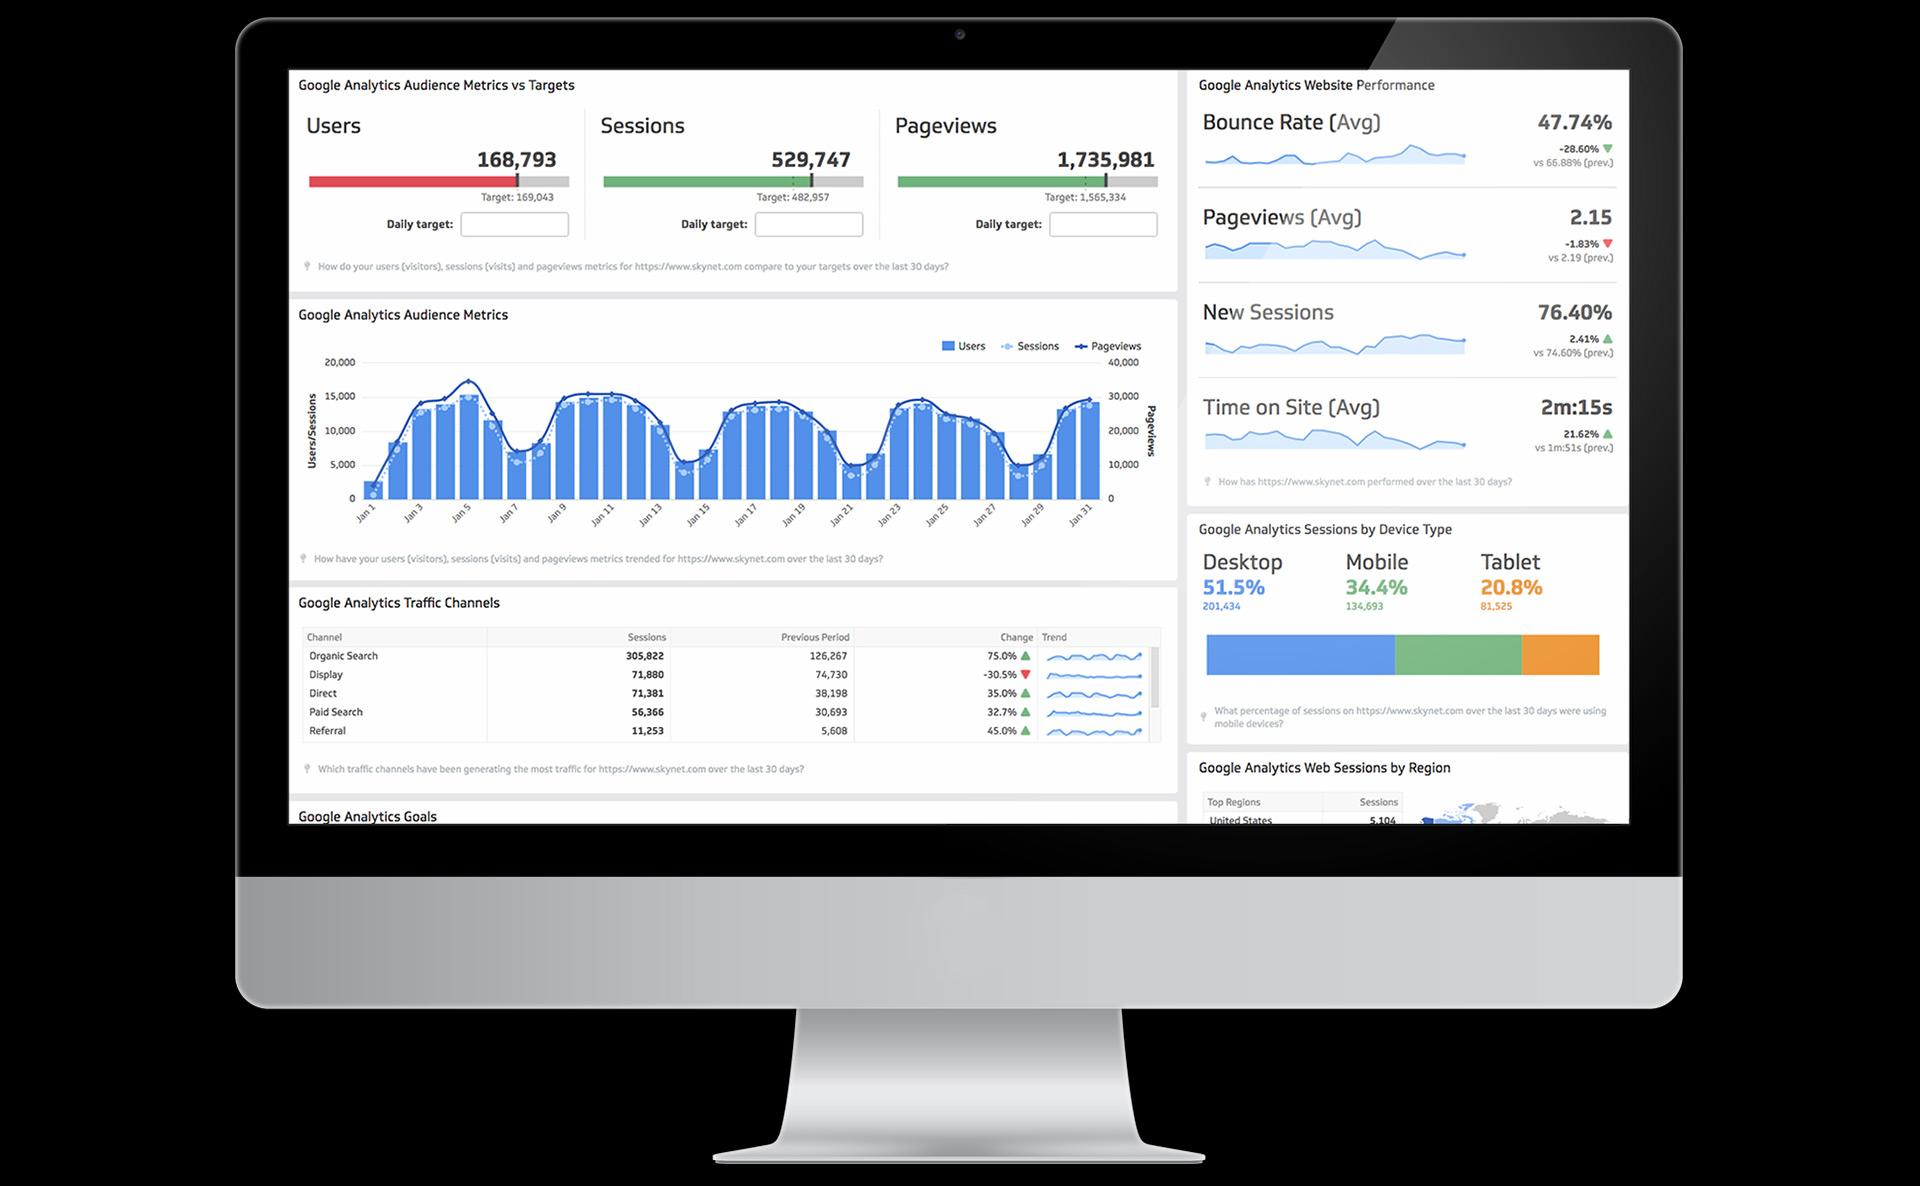 seo-sem-analytics-small-business-website